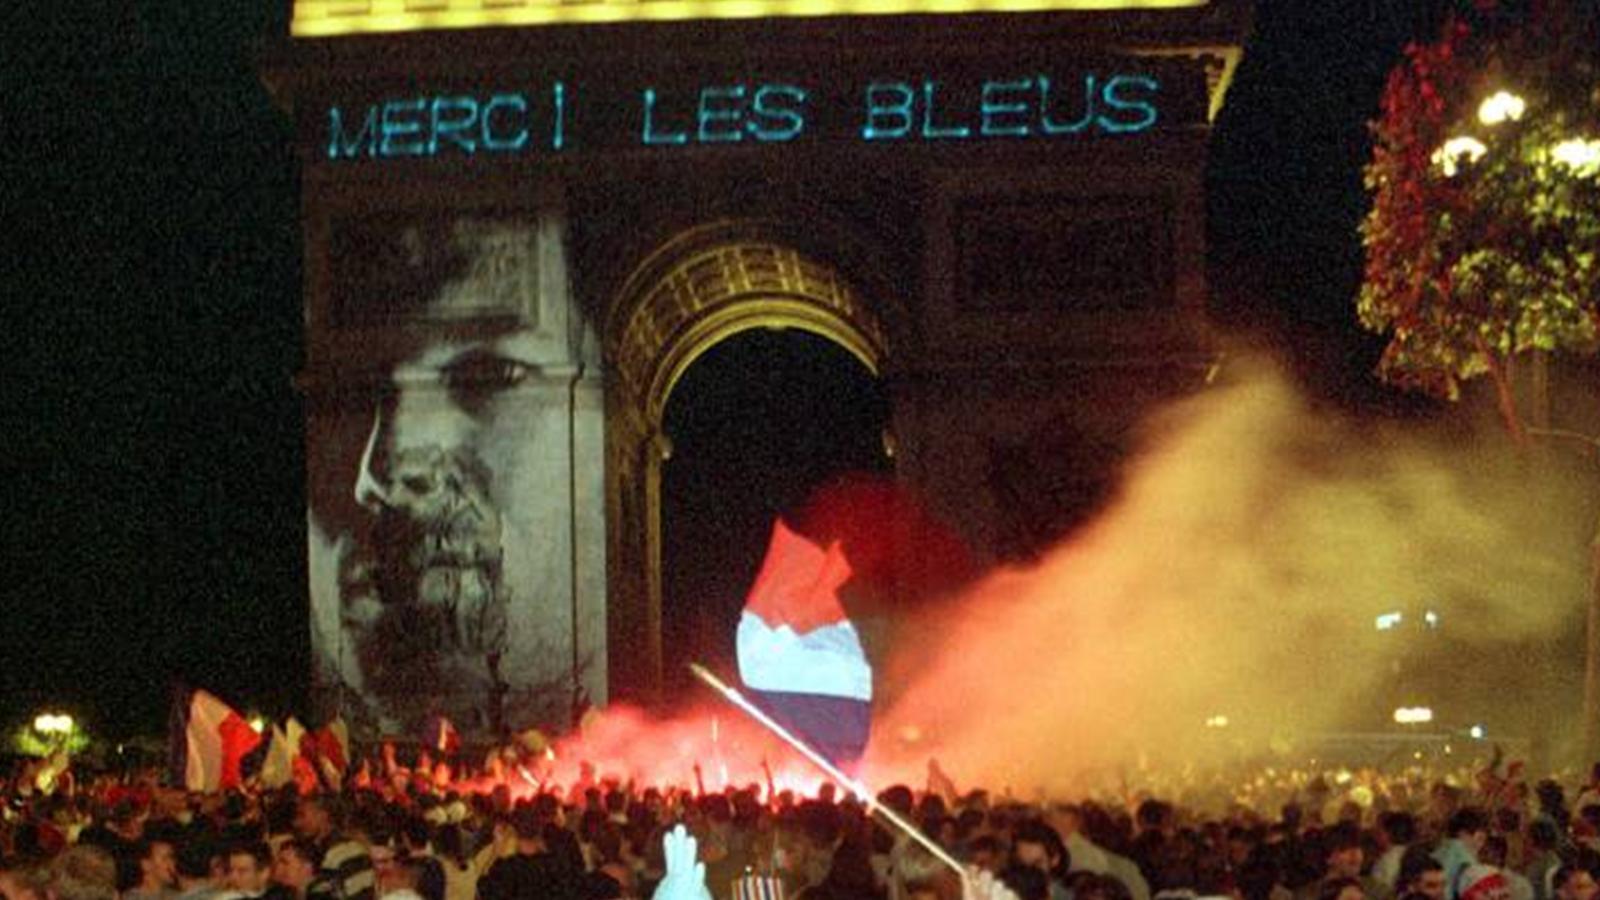 La france black blanc beur france 98 1998 football eurosport - France 98 coupe du monde ...